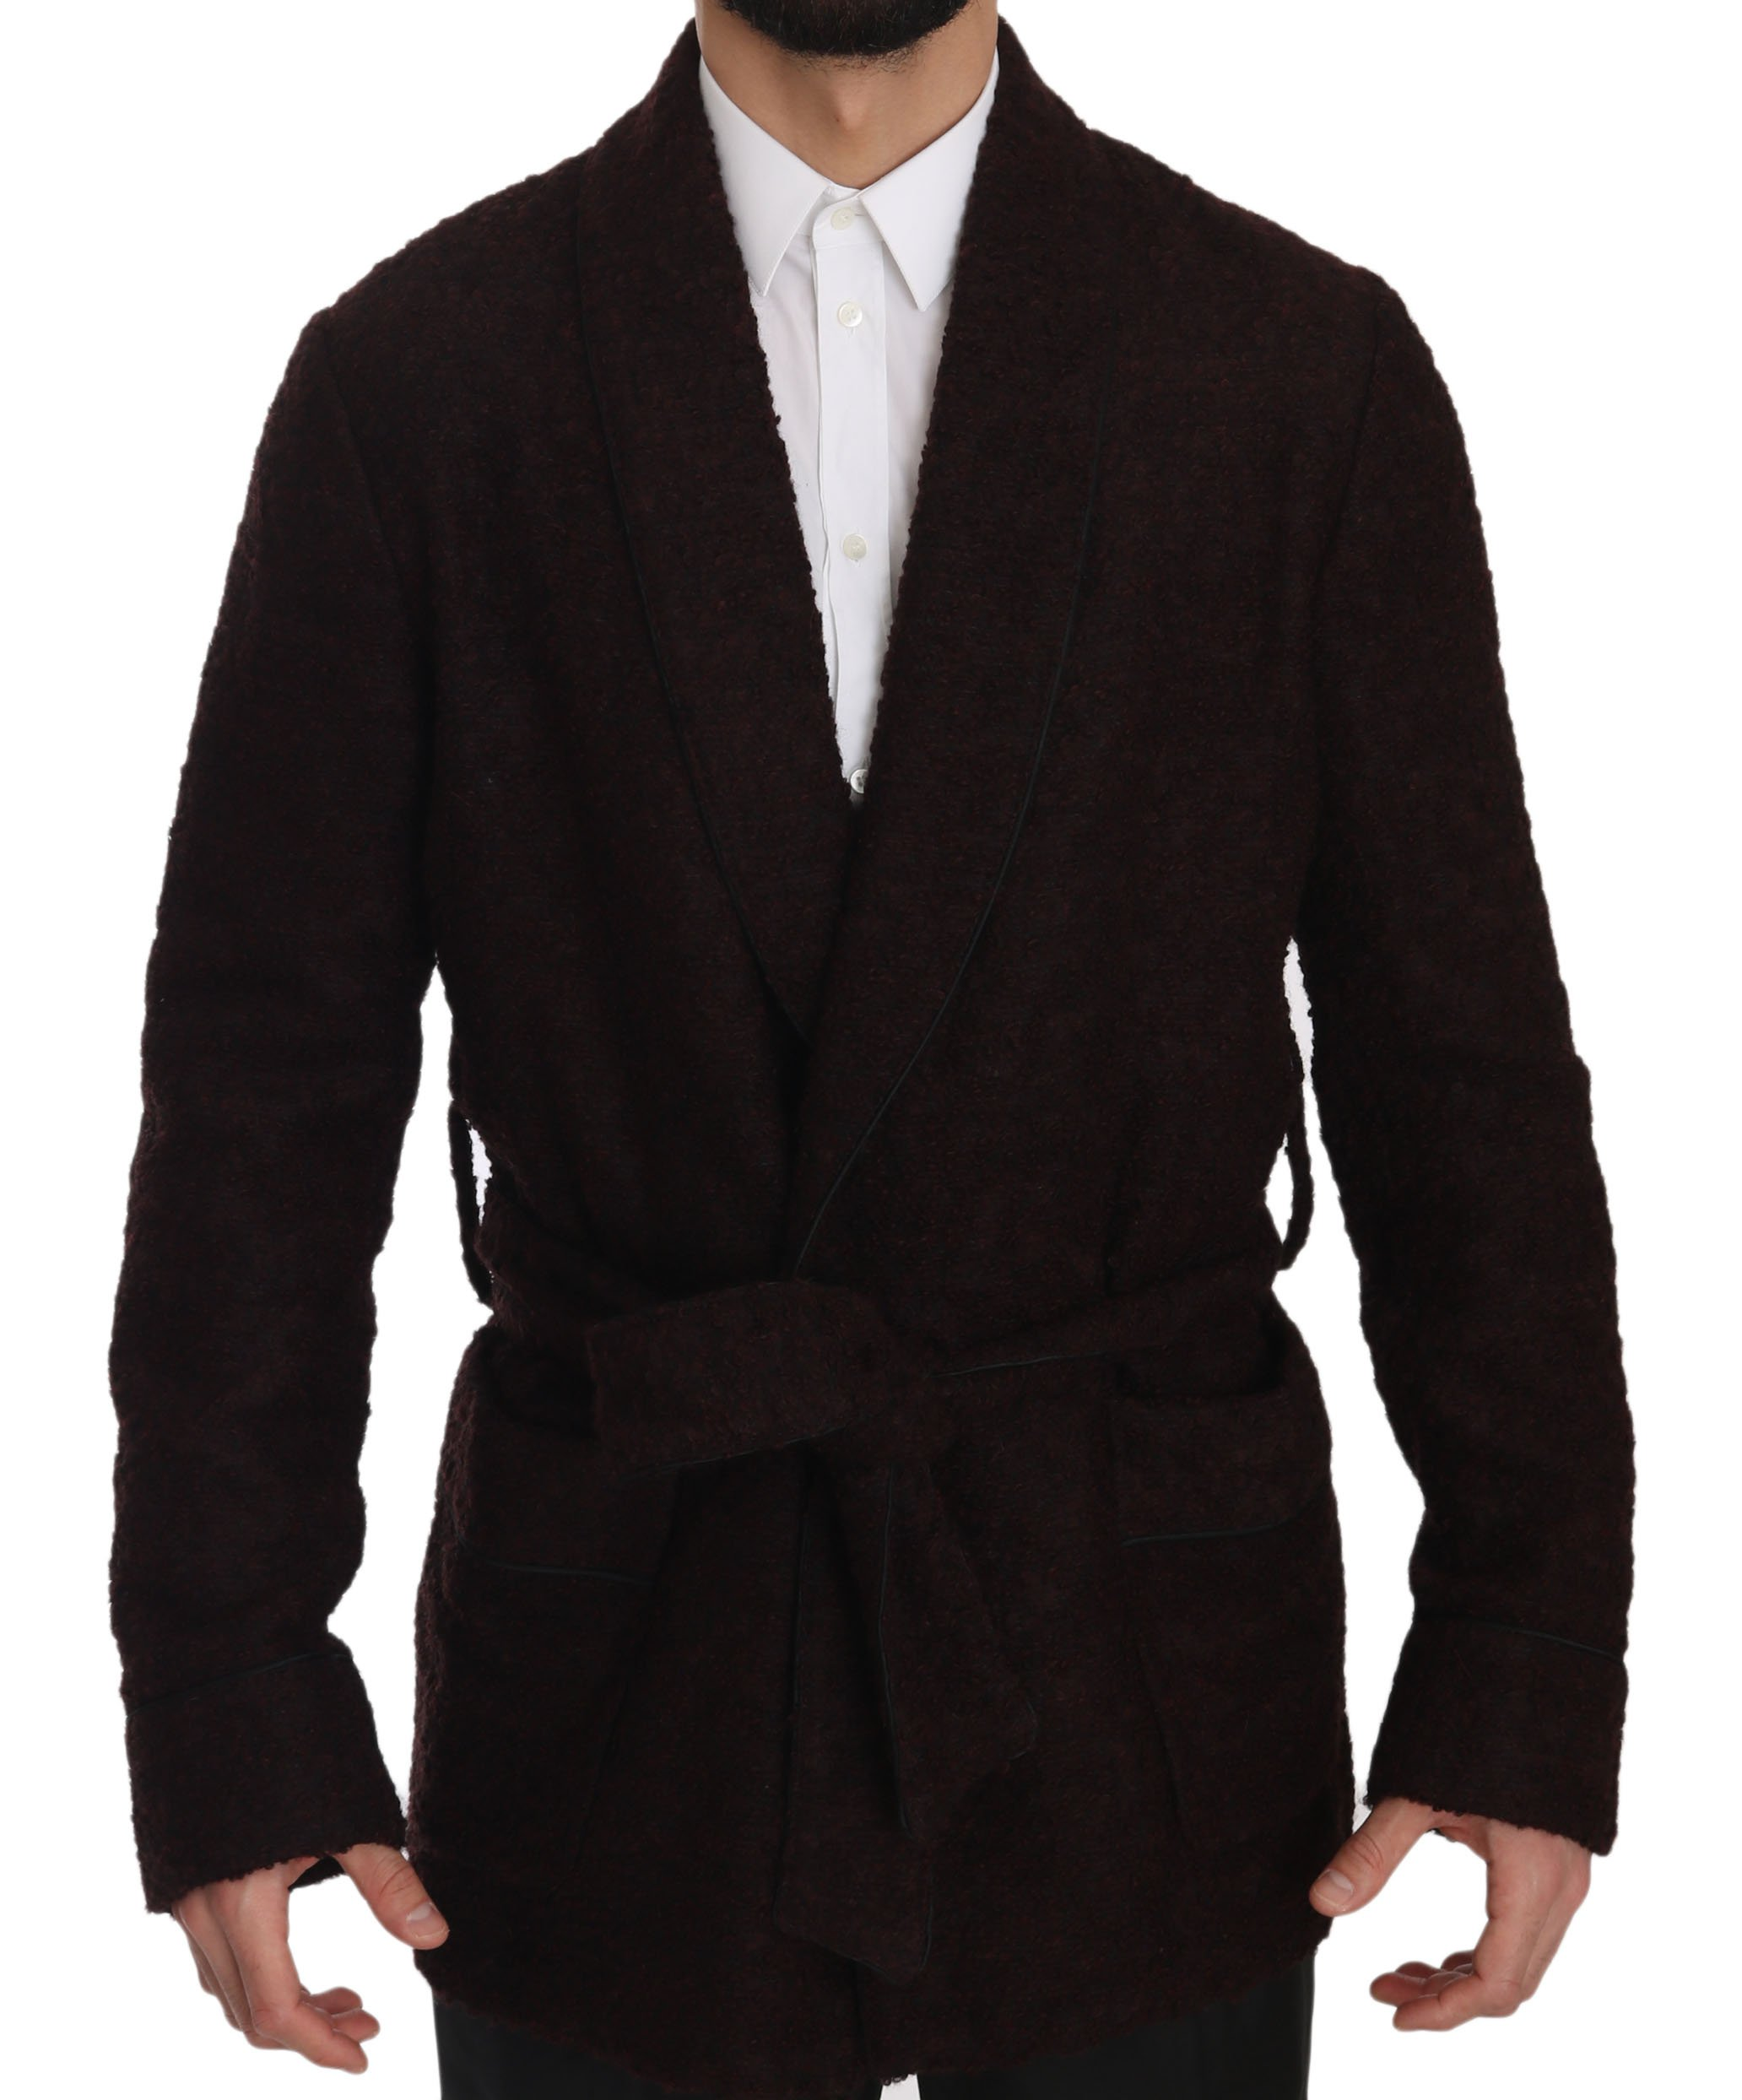 Dolce & Gabbana Men's Jacket Blue JKT2390 - IT48 | M